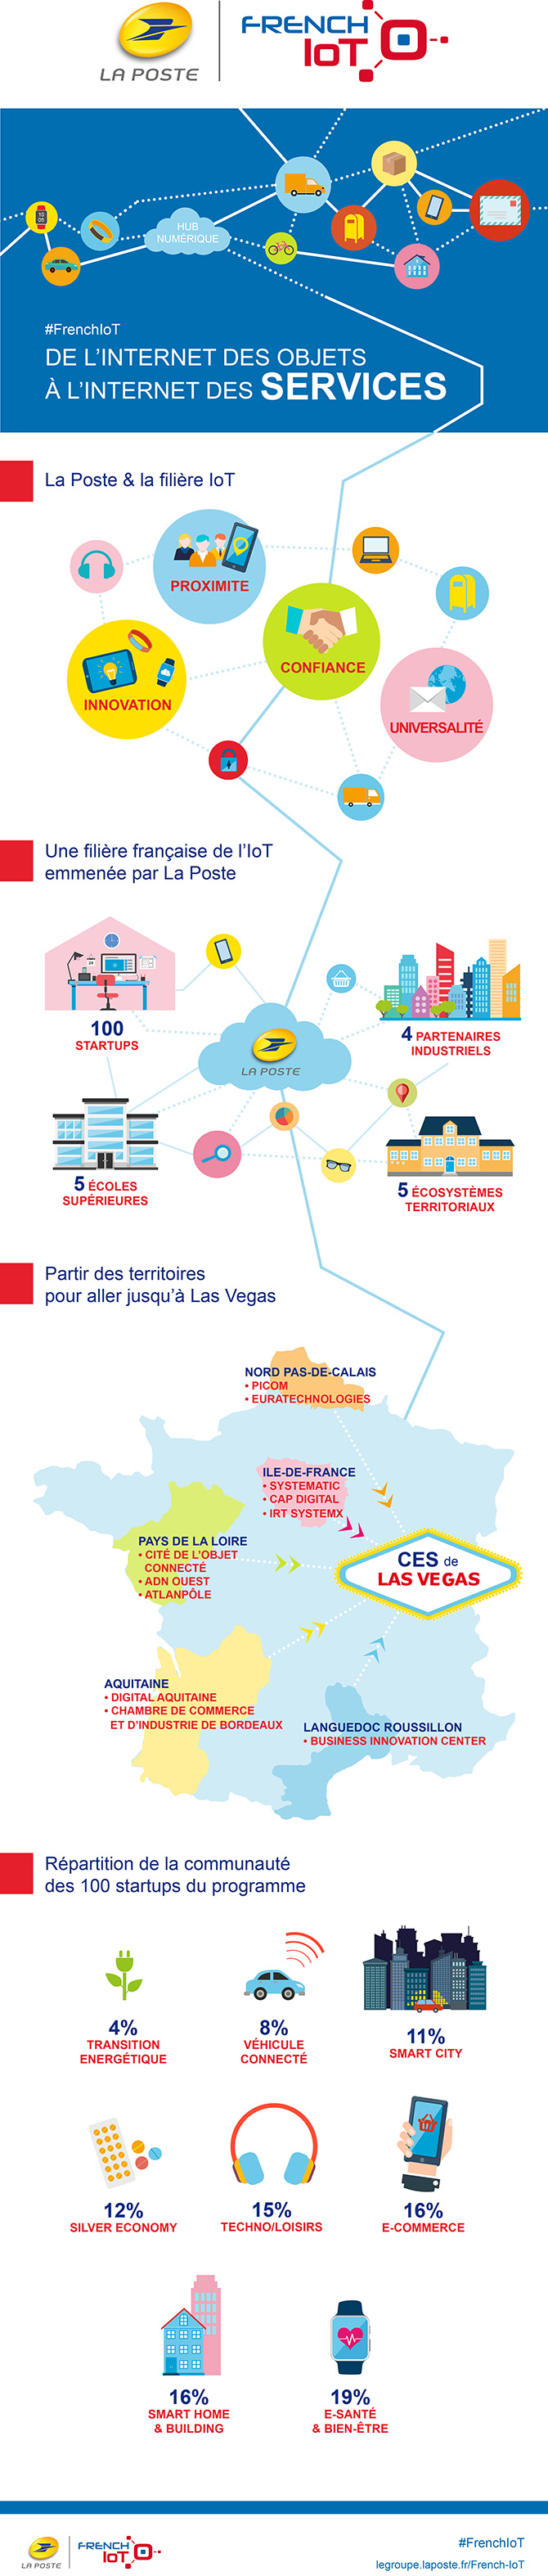 Infographie CES BNP Paribas Realestate